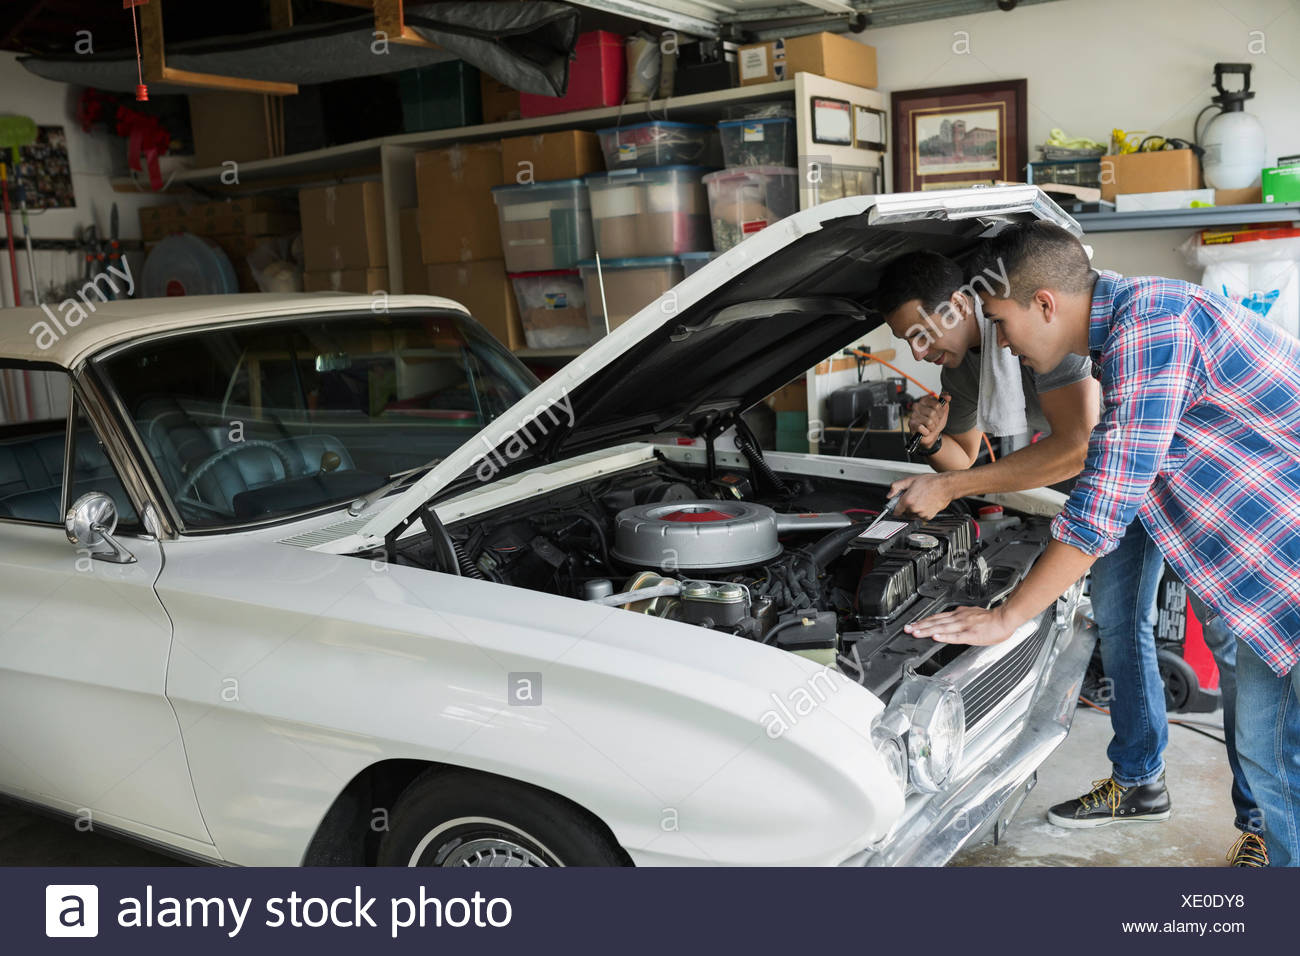 Father and son restoring vintage car engine garage - Stock Image